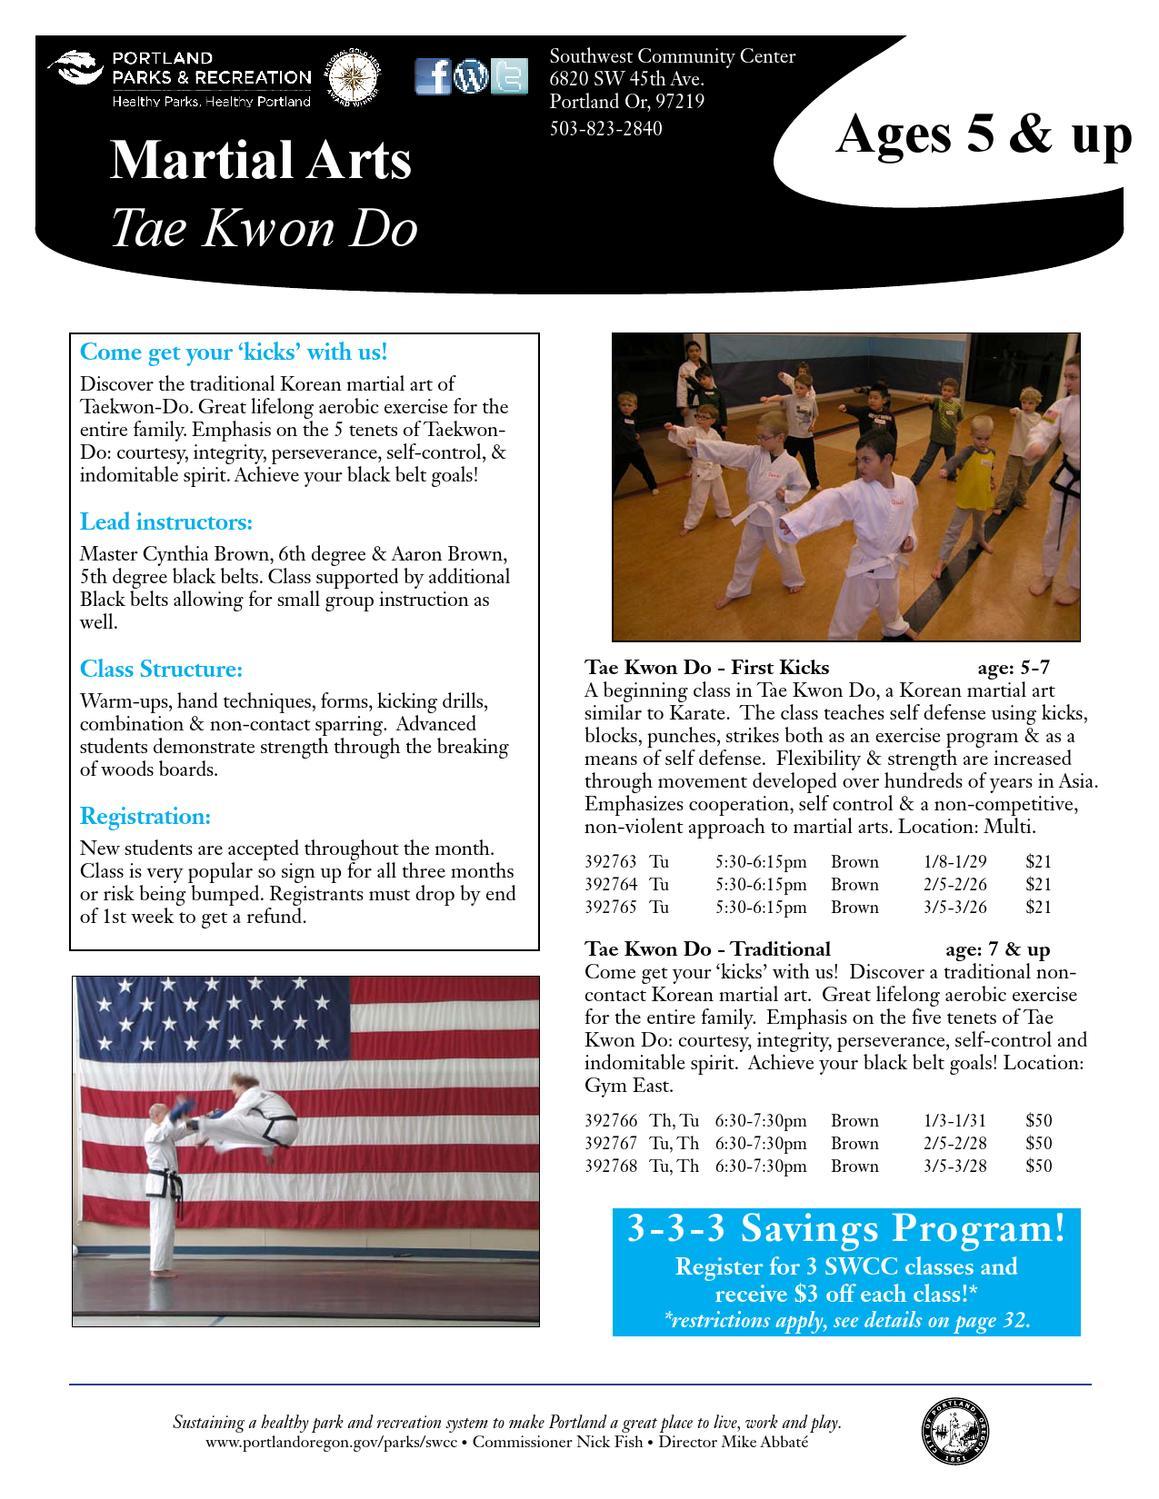 SWCC Tae Kwon Do WI13 by Portland Parks & Recreation - issuu